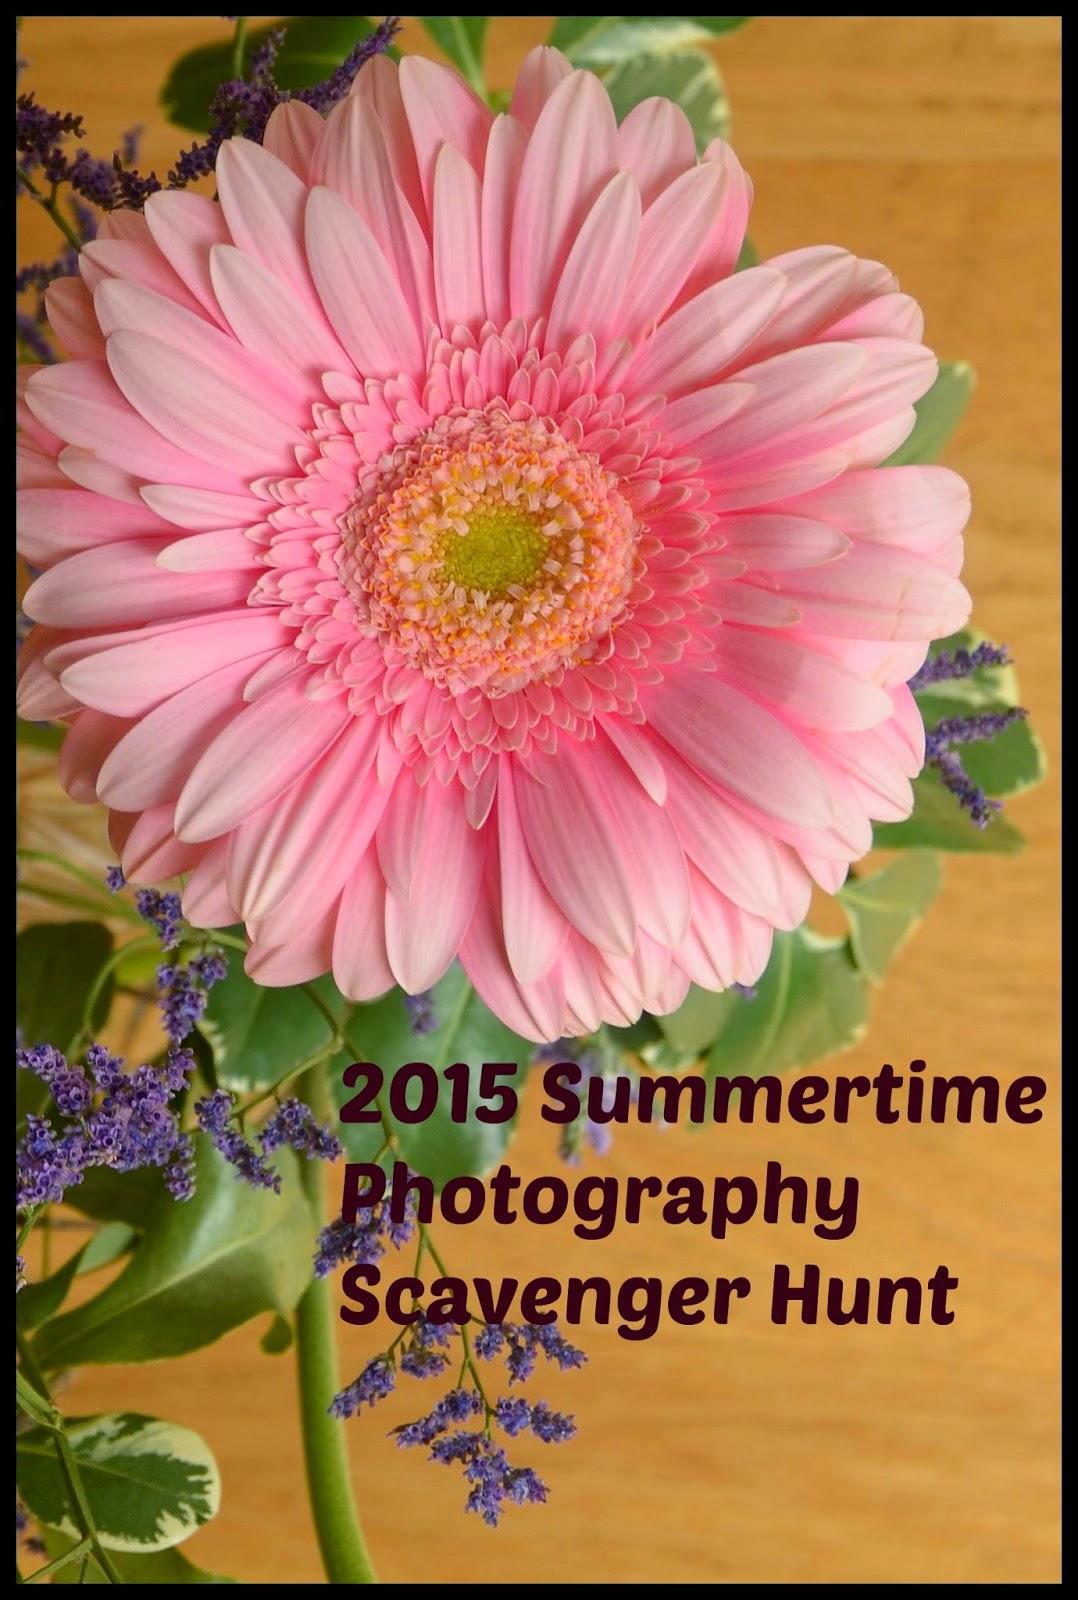 Scavenger Hunt 2015